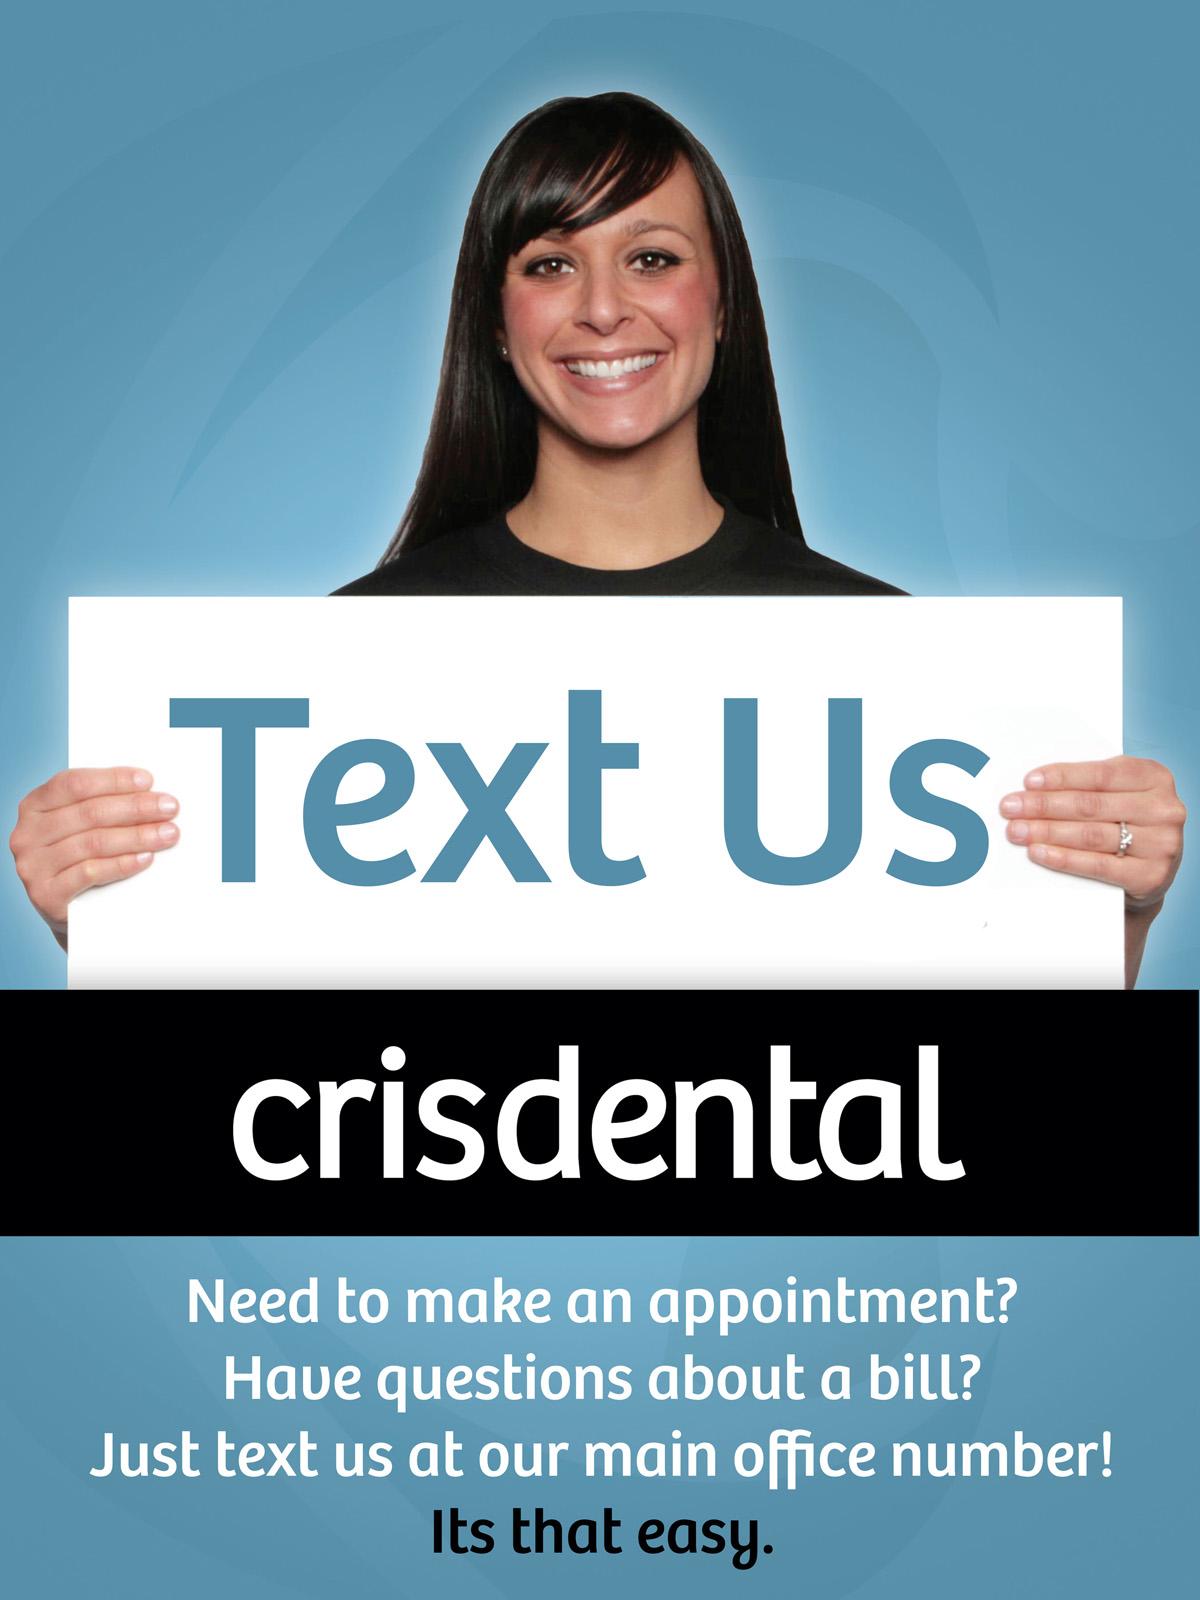 Crisdental Text Us Poster